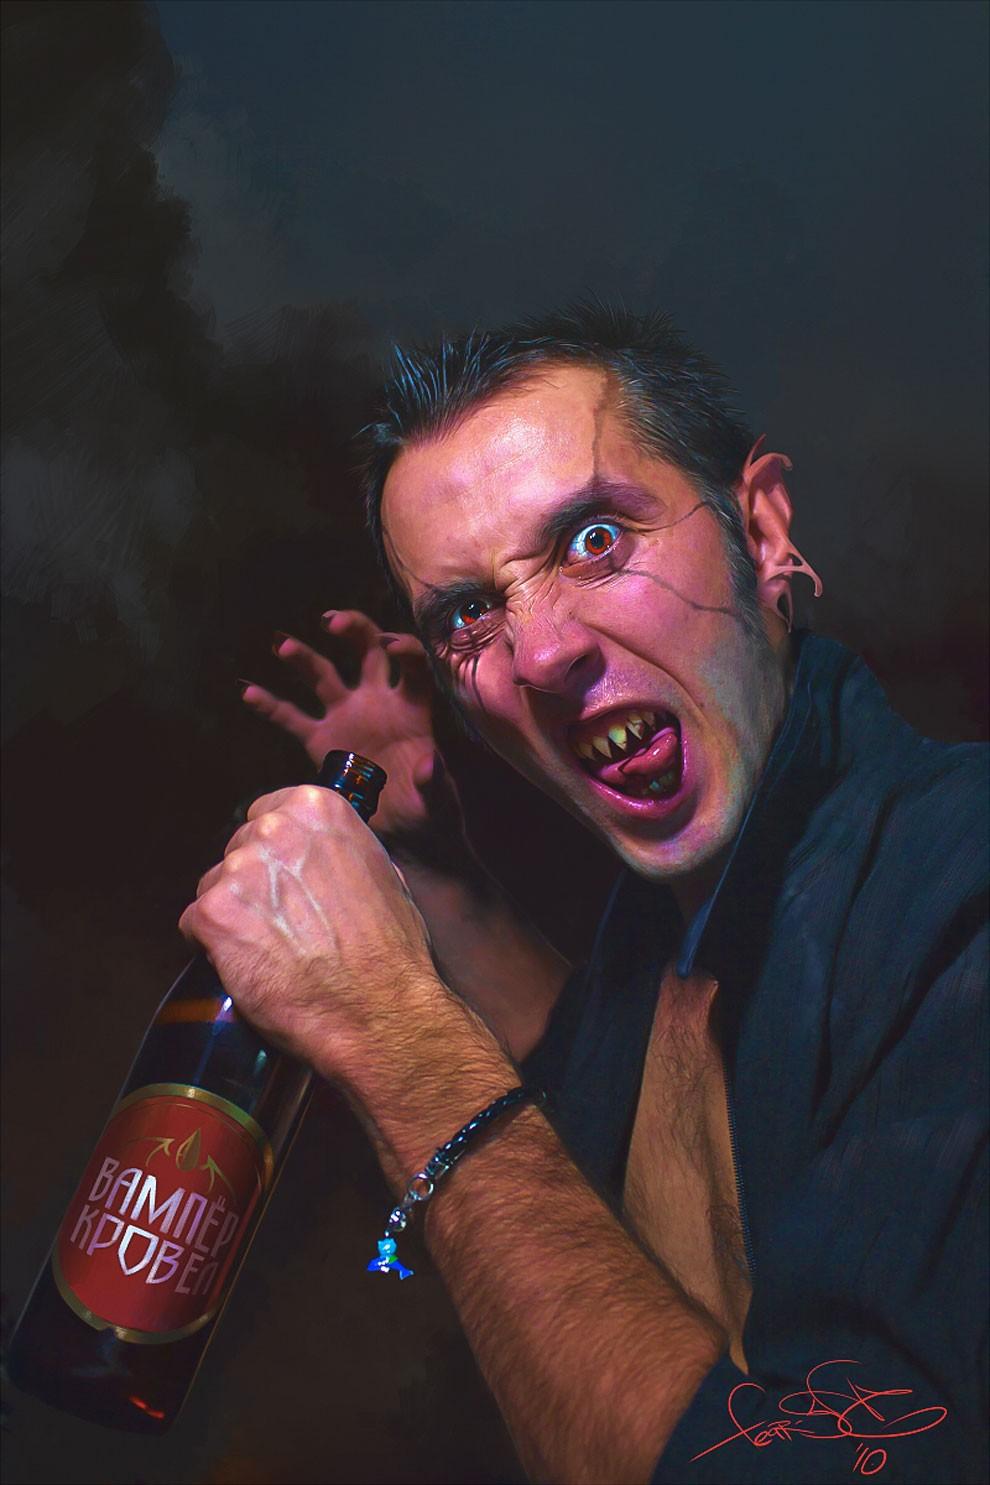 illustrazioni-dipinti-digitali-humor-horror-fantasy-sergey-svistunov-48